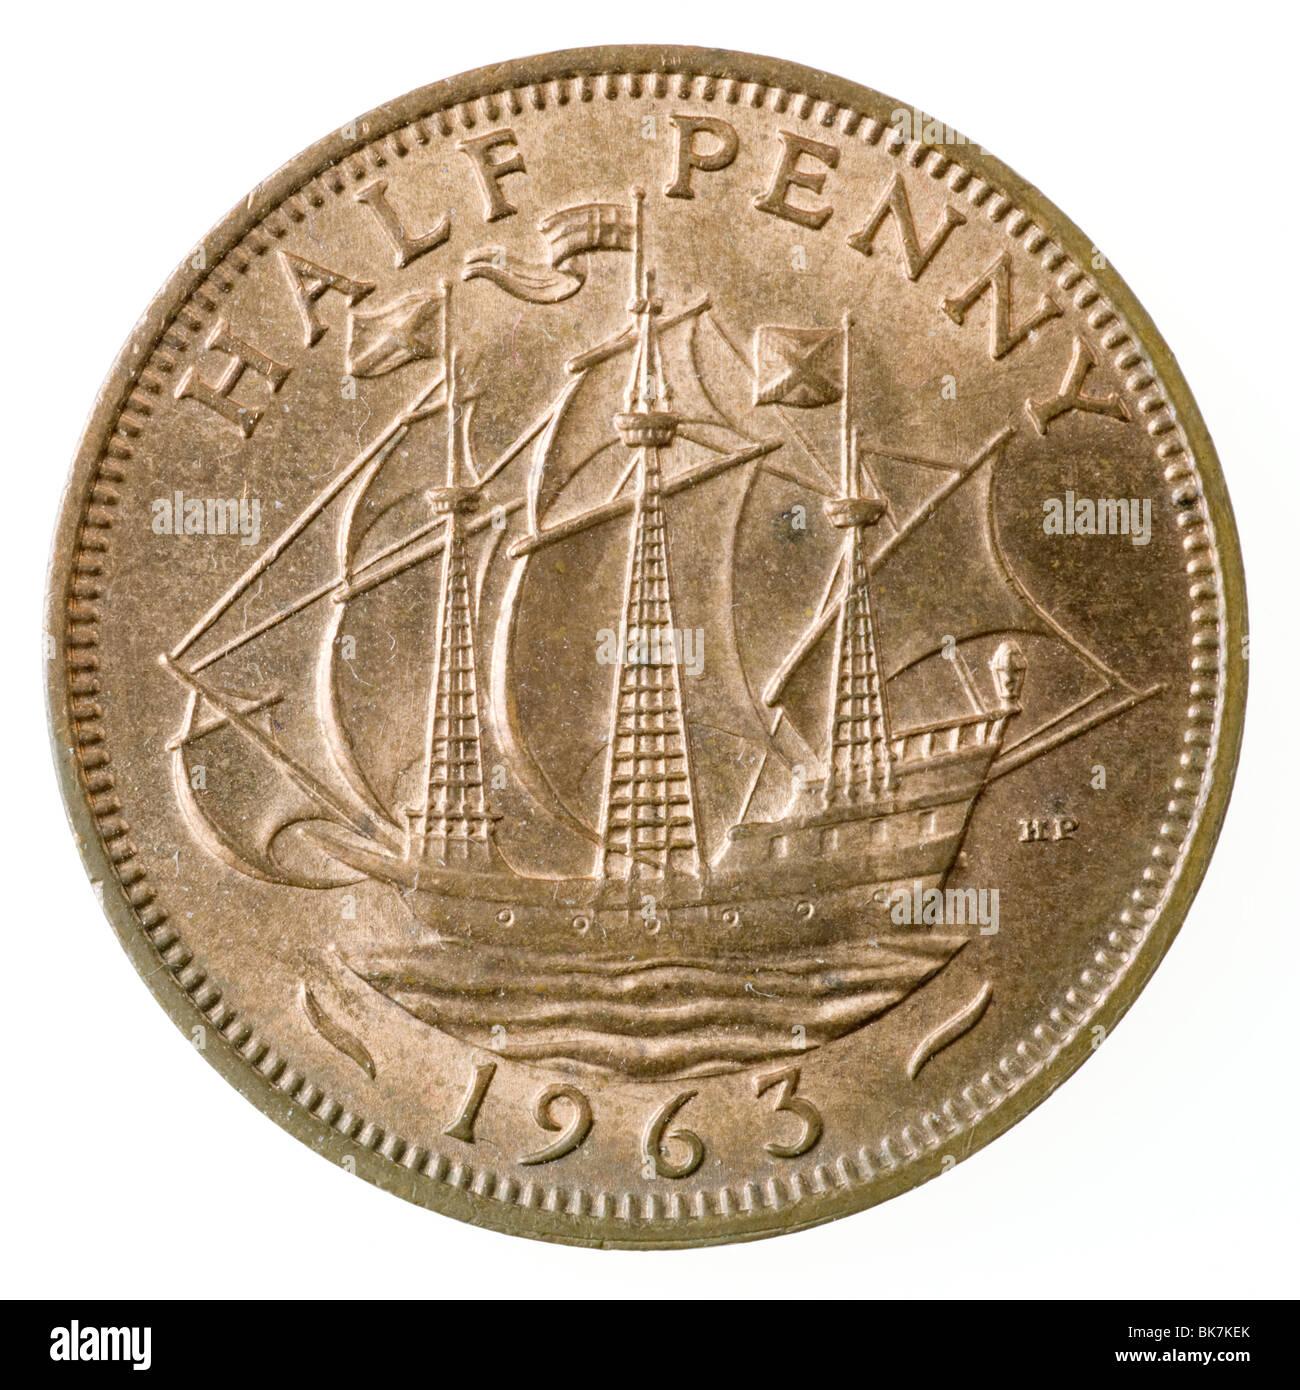 1963 British Half Penny coin - Stock Image